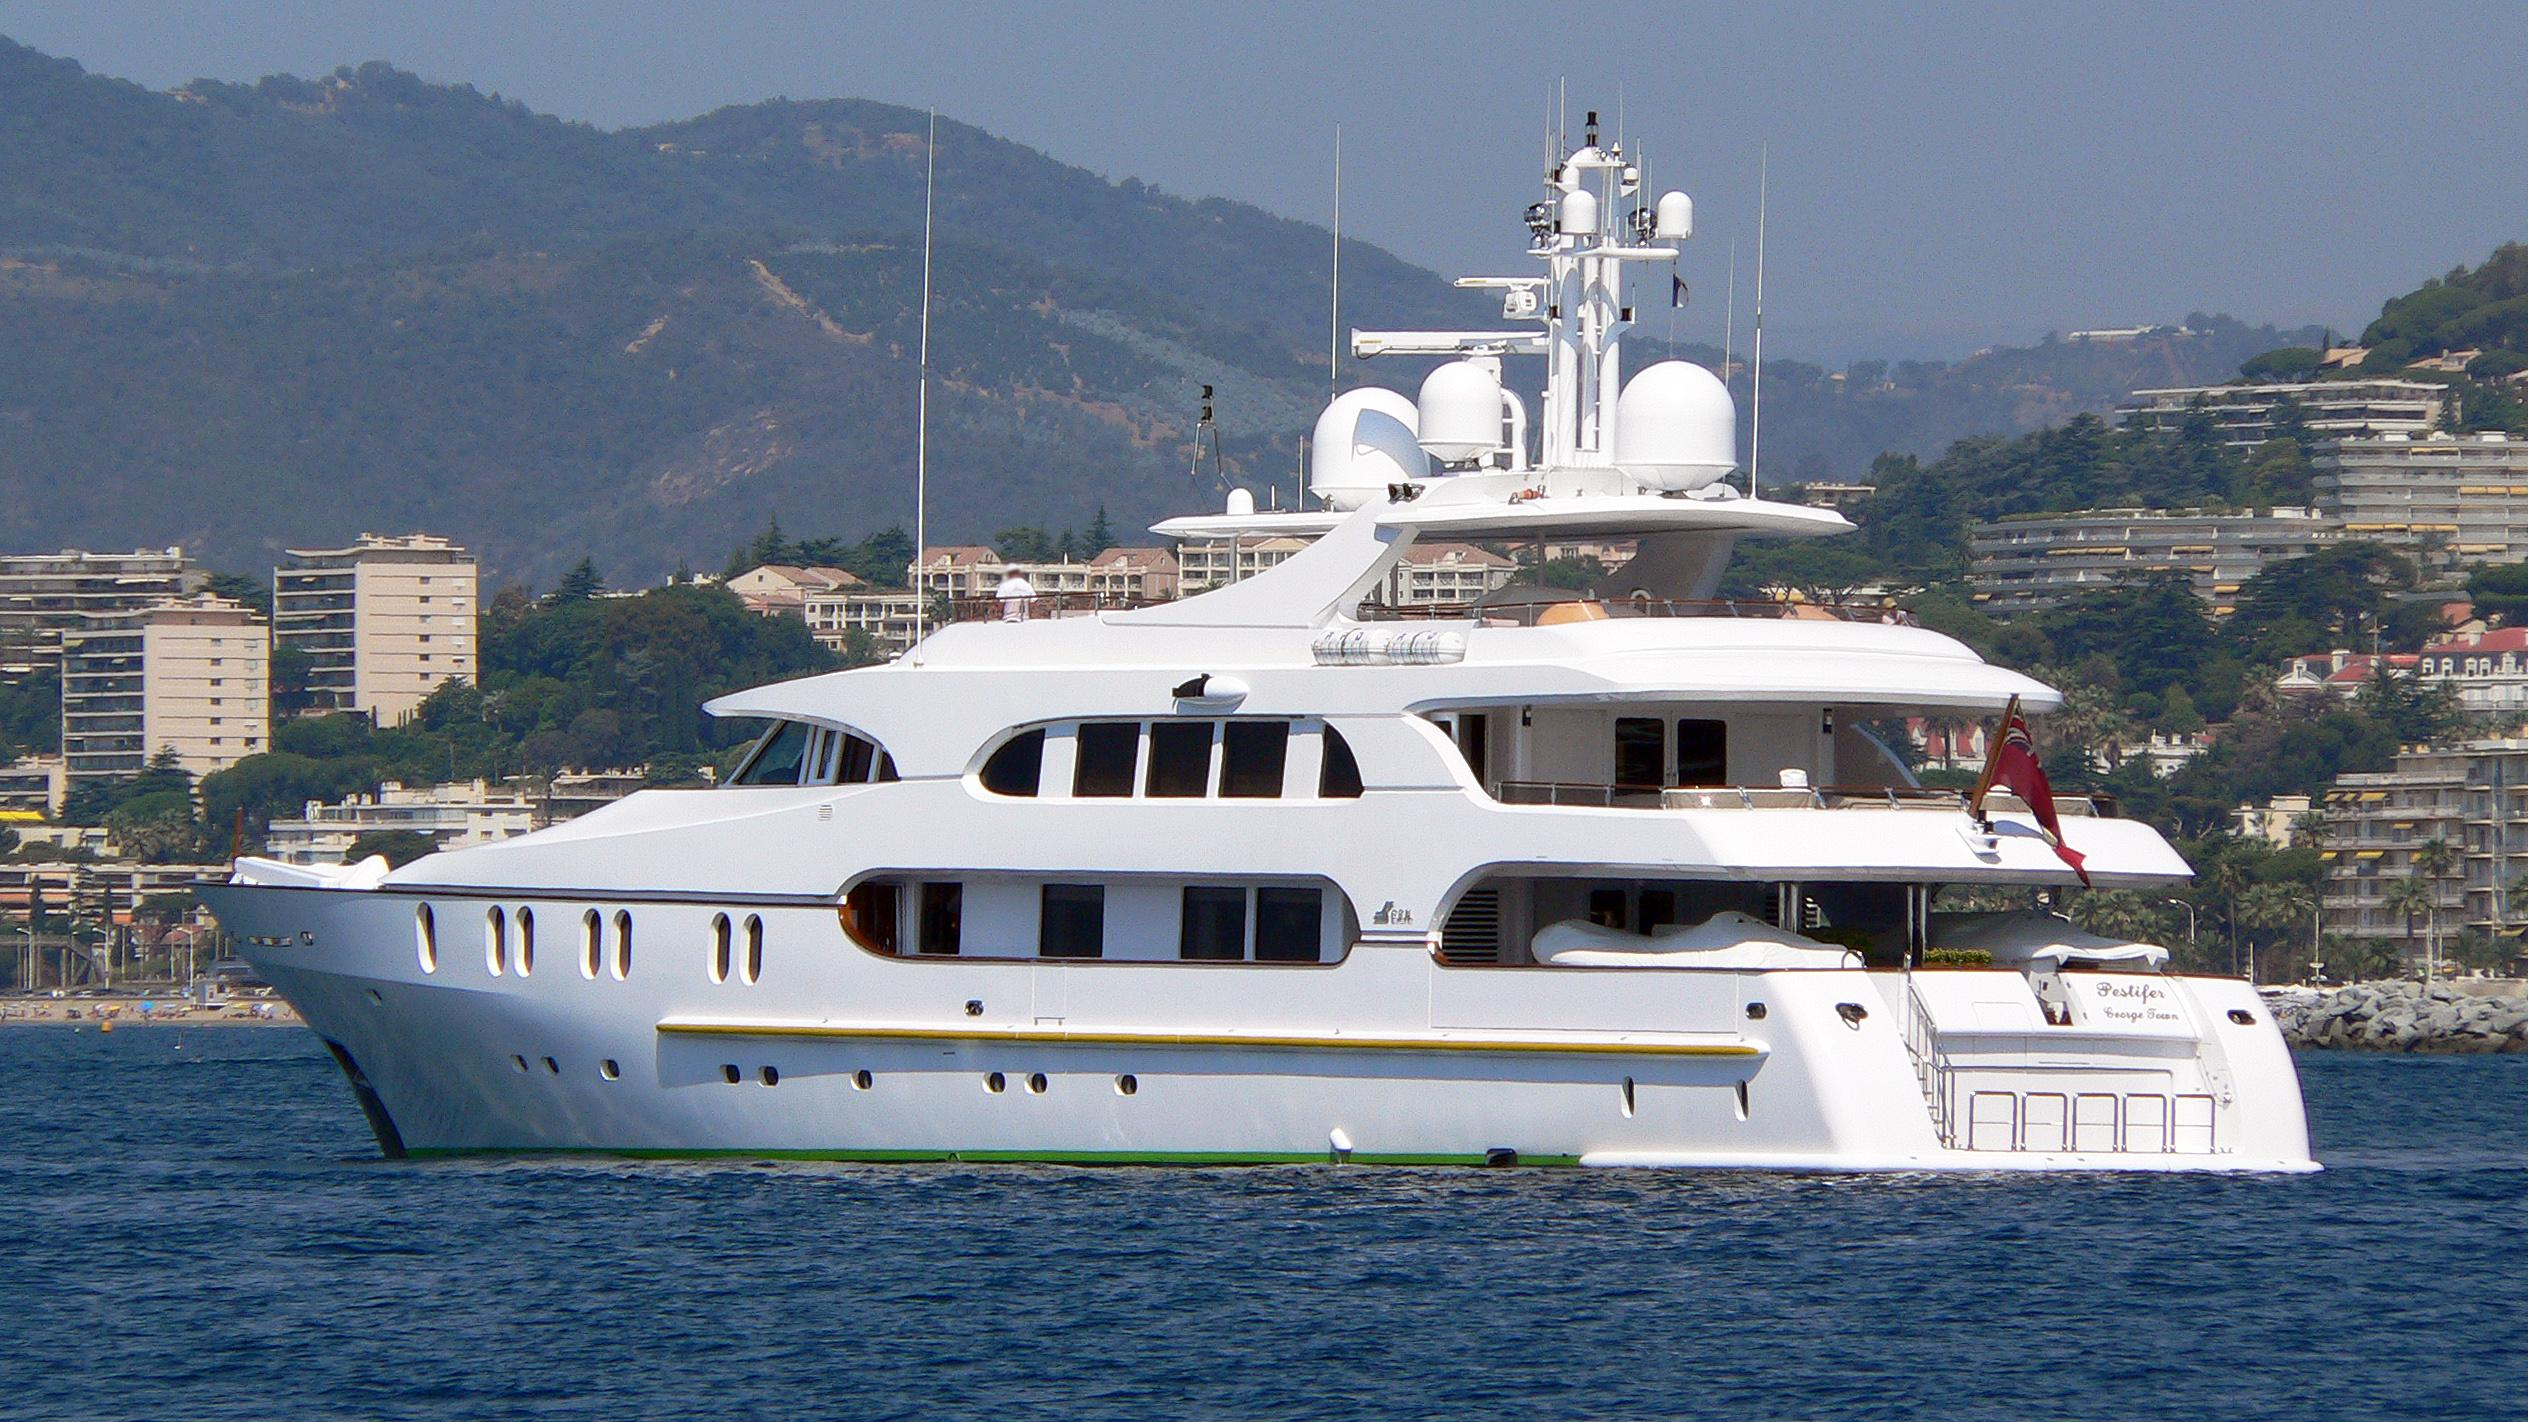 dr-no-no-motoryacht-crn-1998-50m-stern